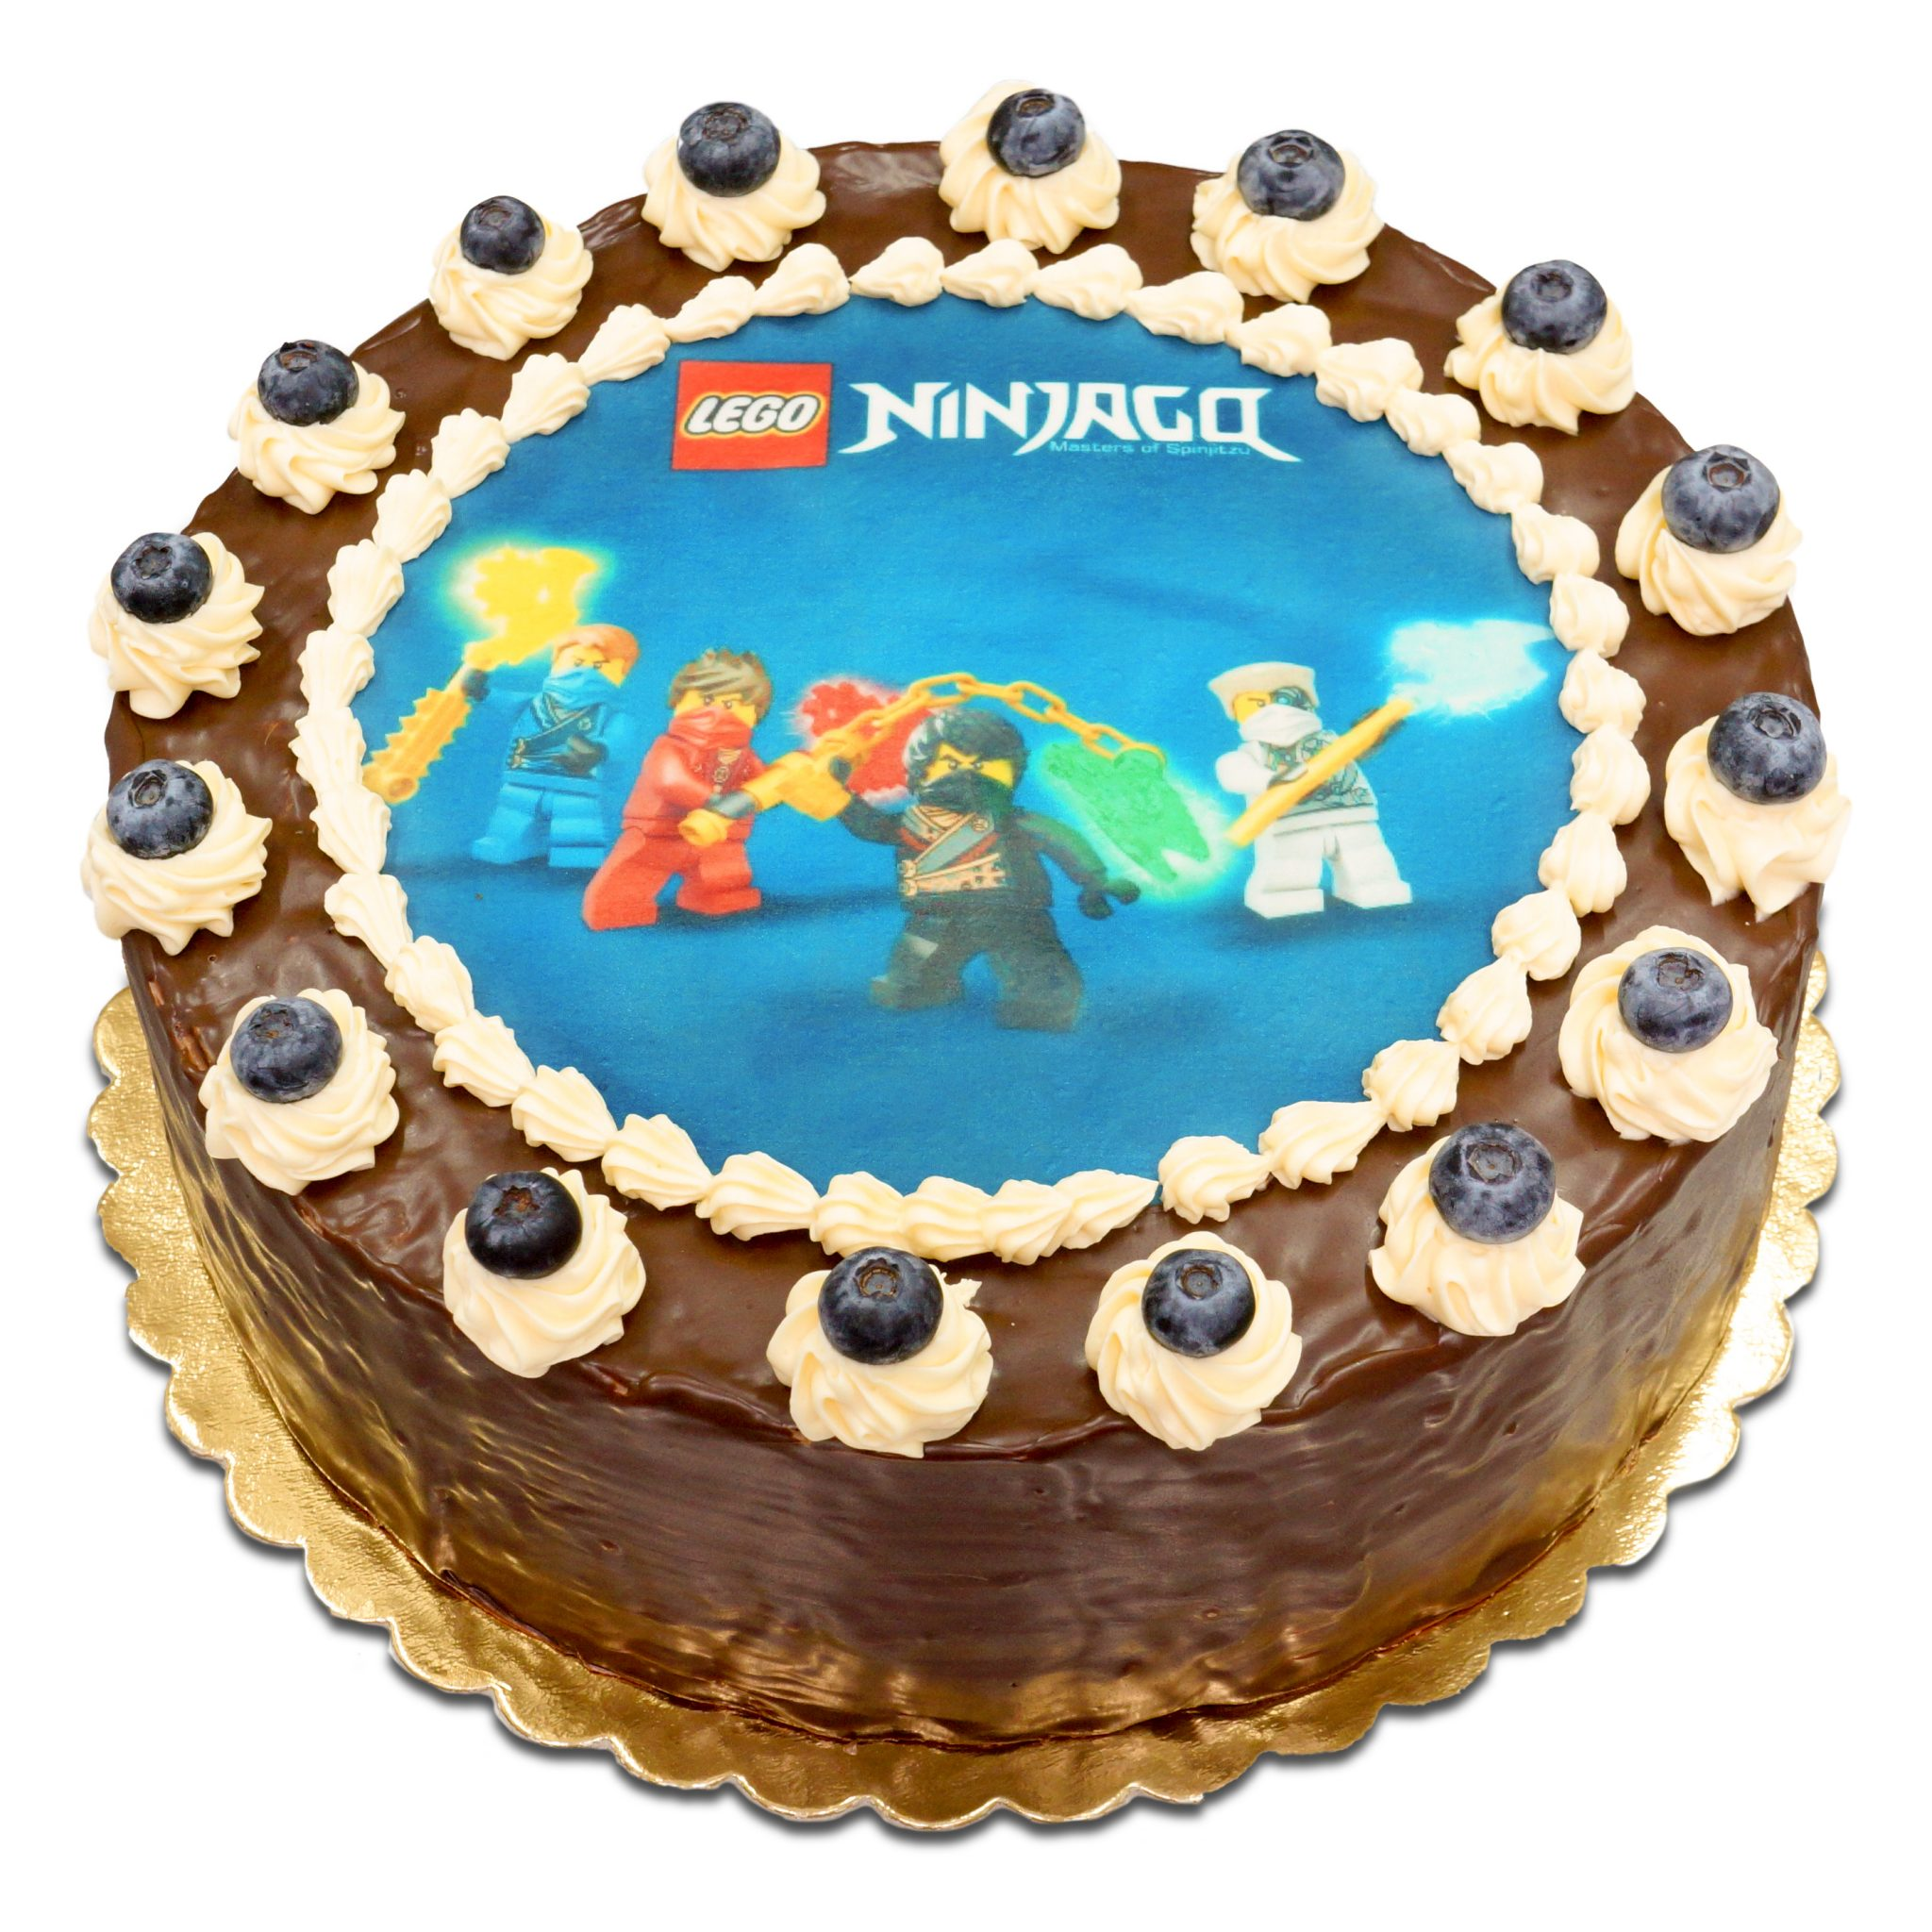 Tort ostrow z nadrukiem LEGO Ninjago